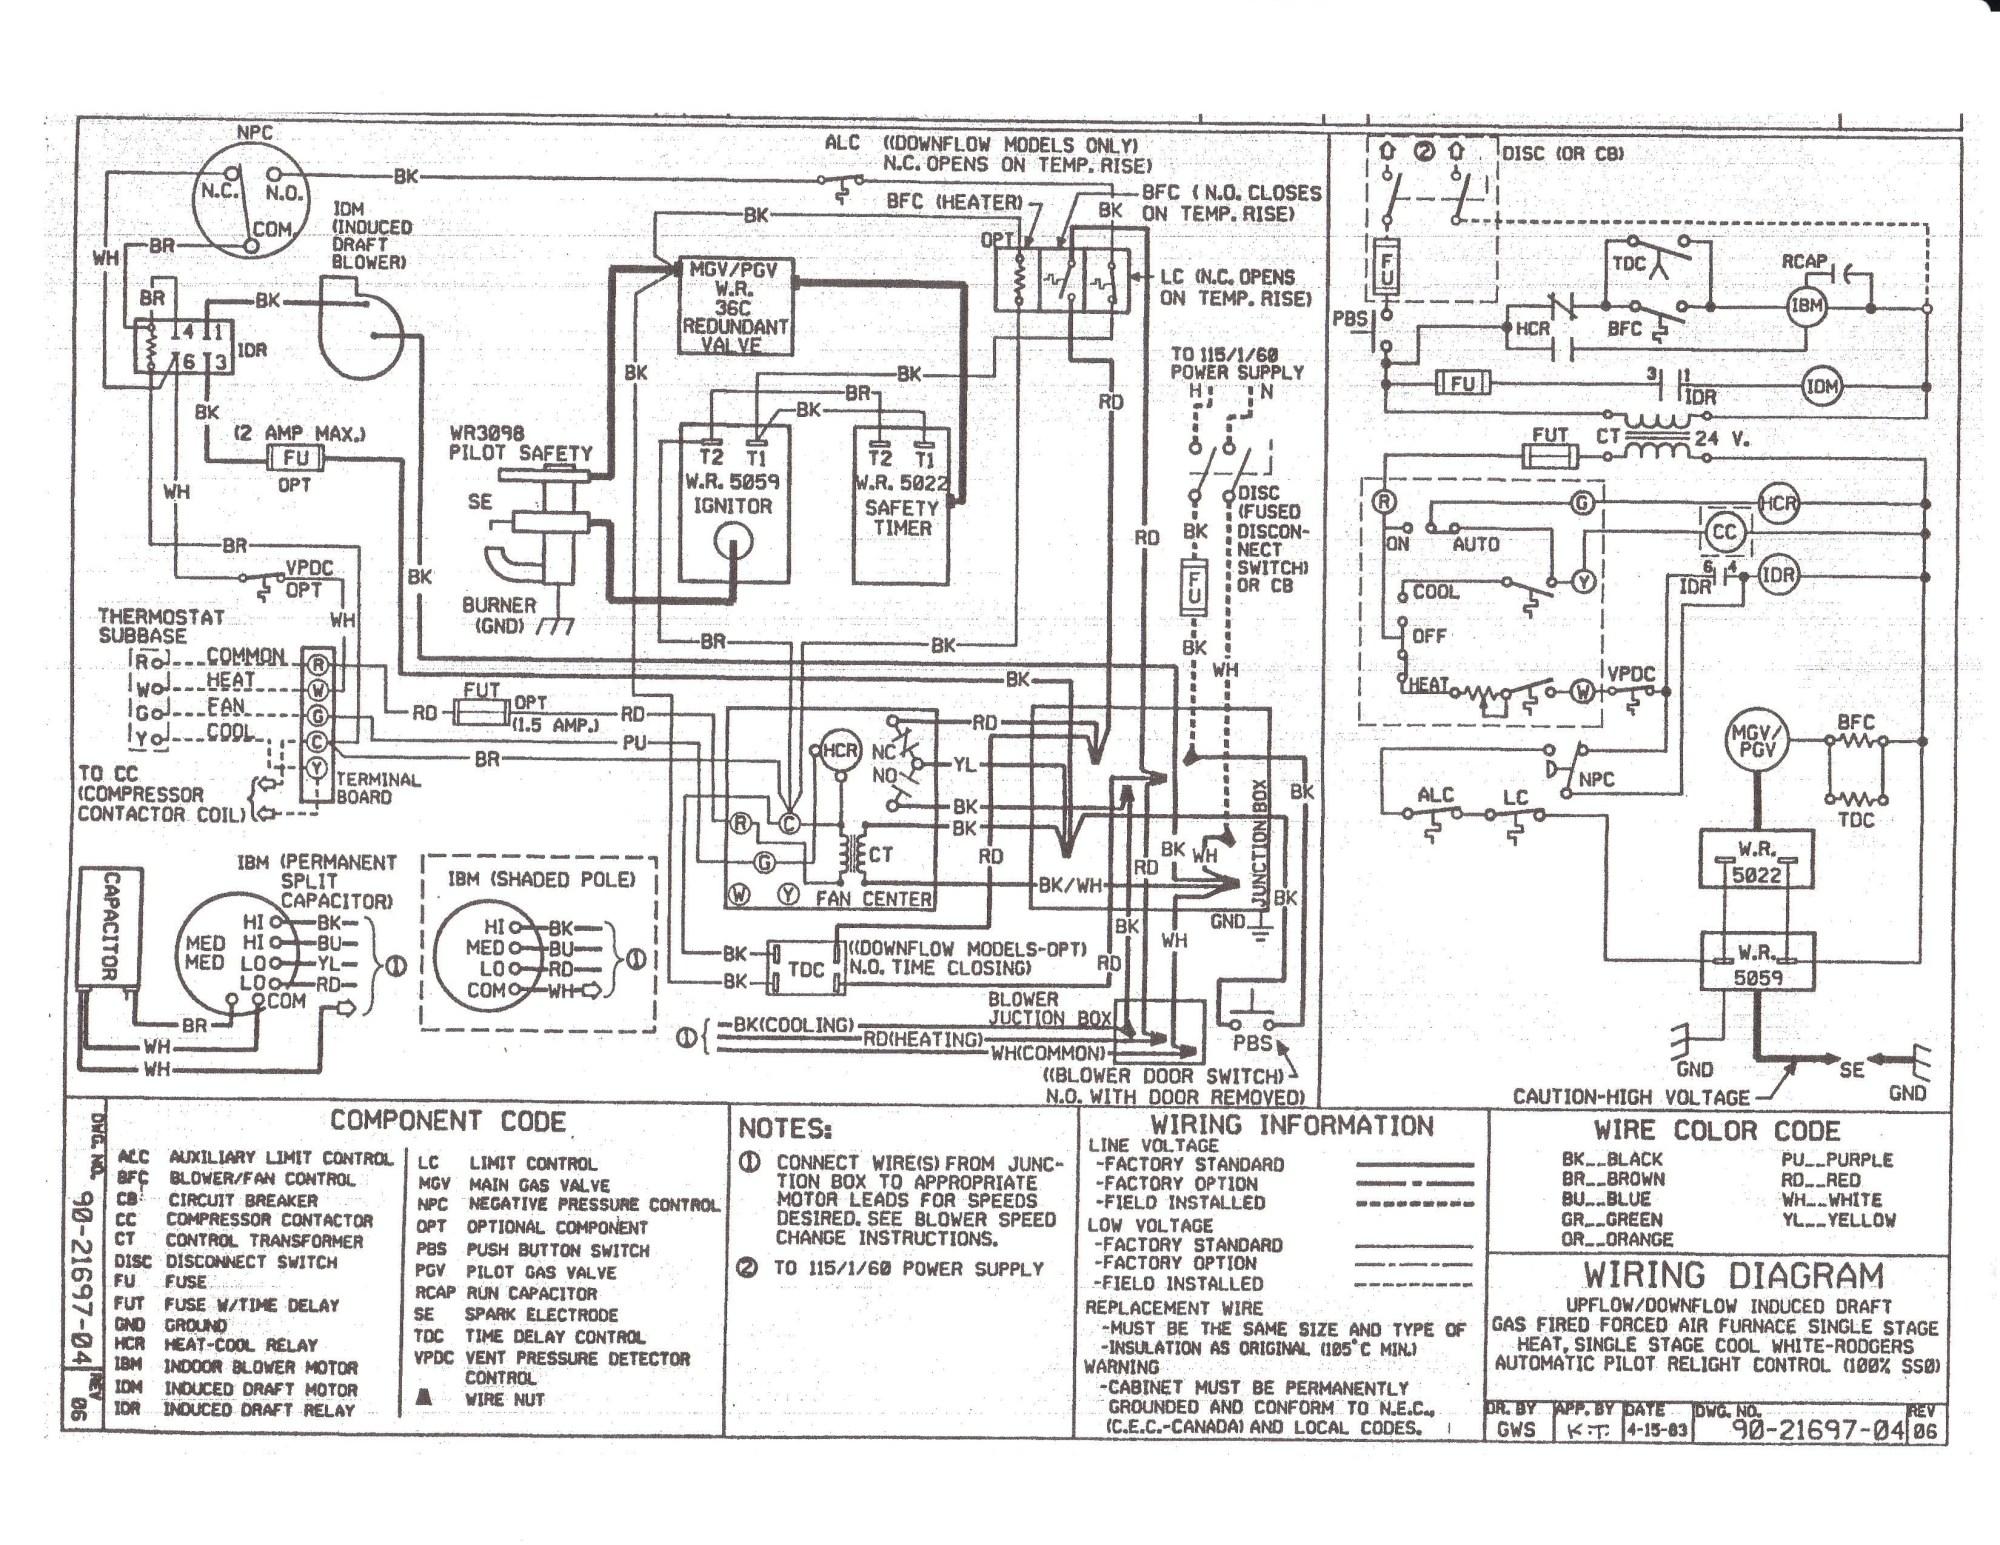 hight resolution of york air handler wiring diagram free wiring diagramyork air handler wiring diagram wiring diagram for york